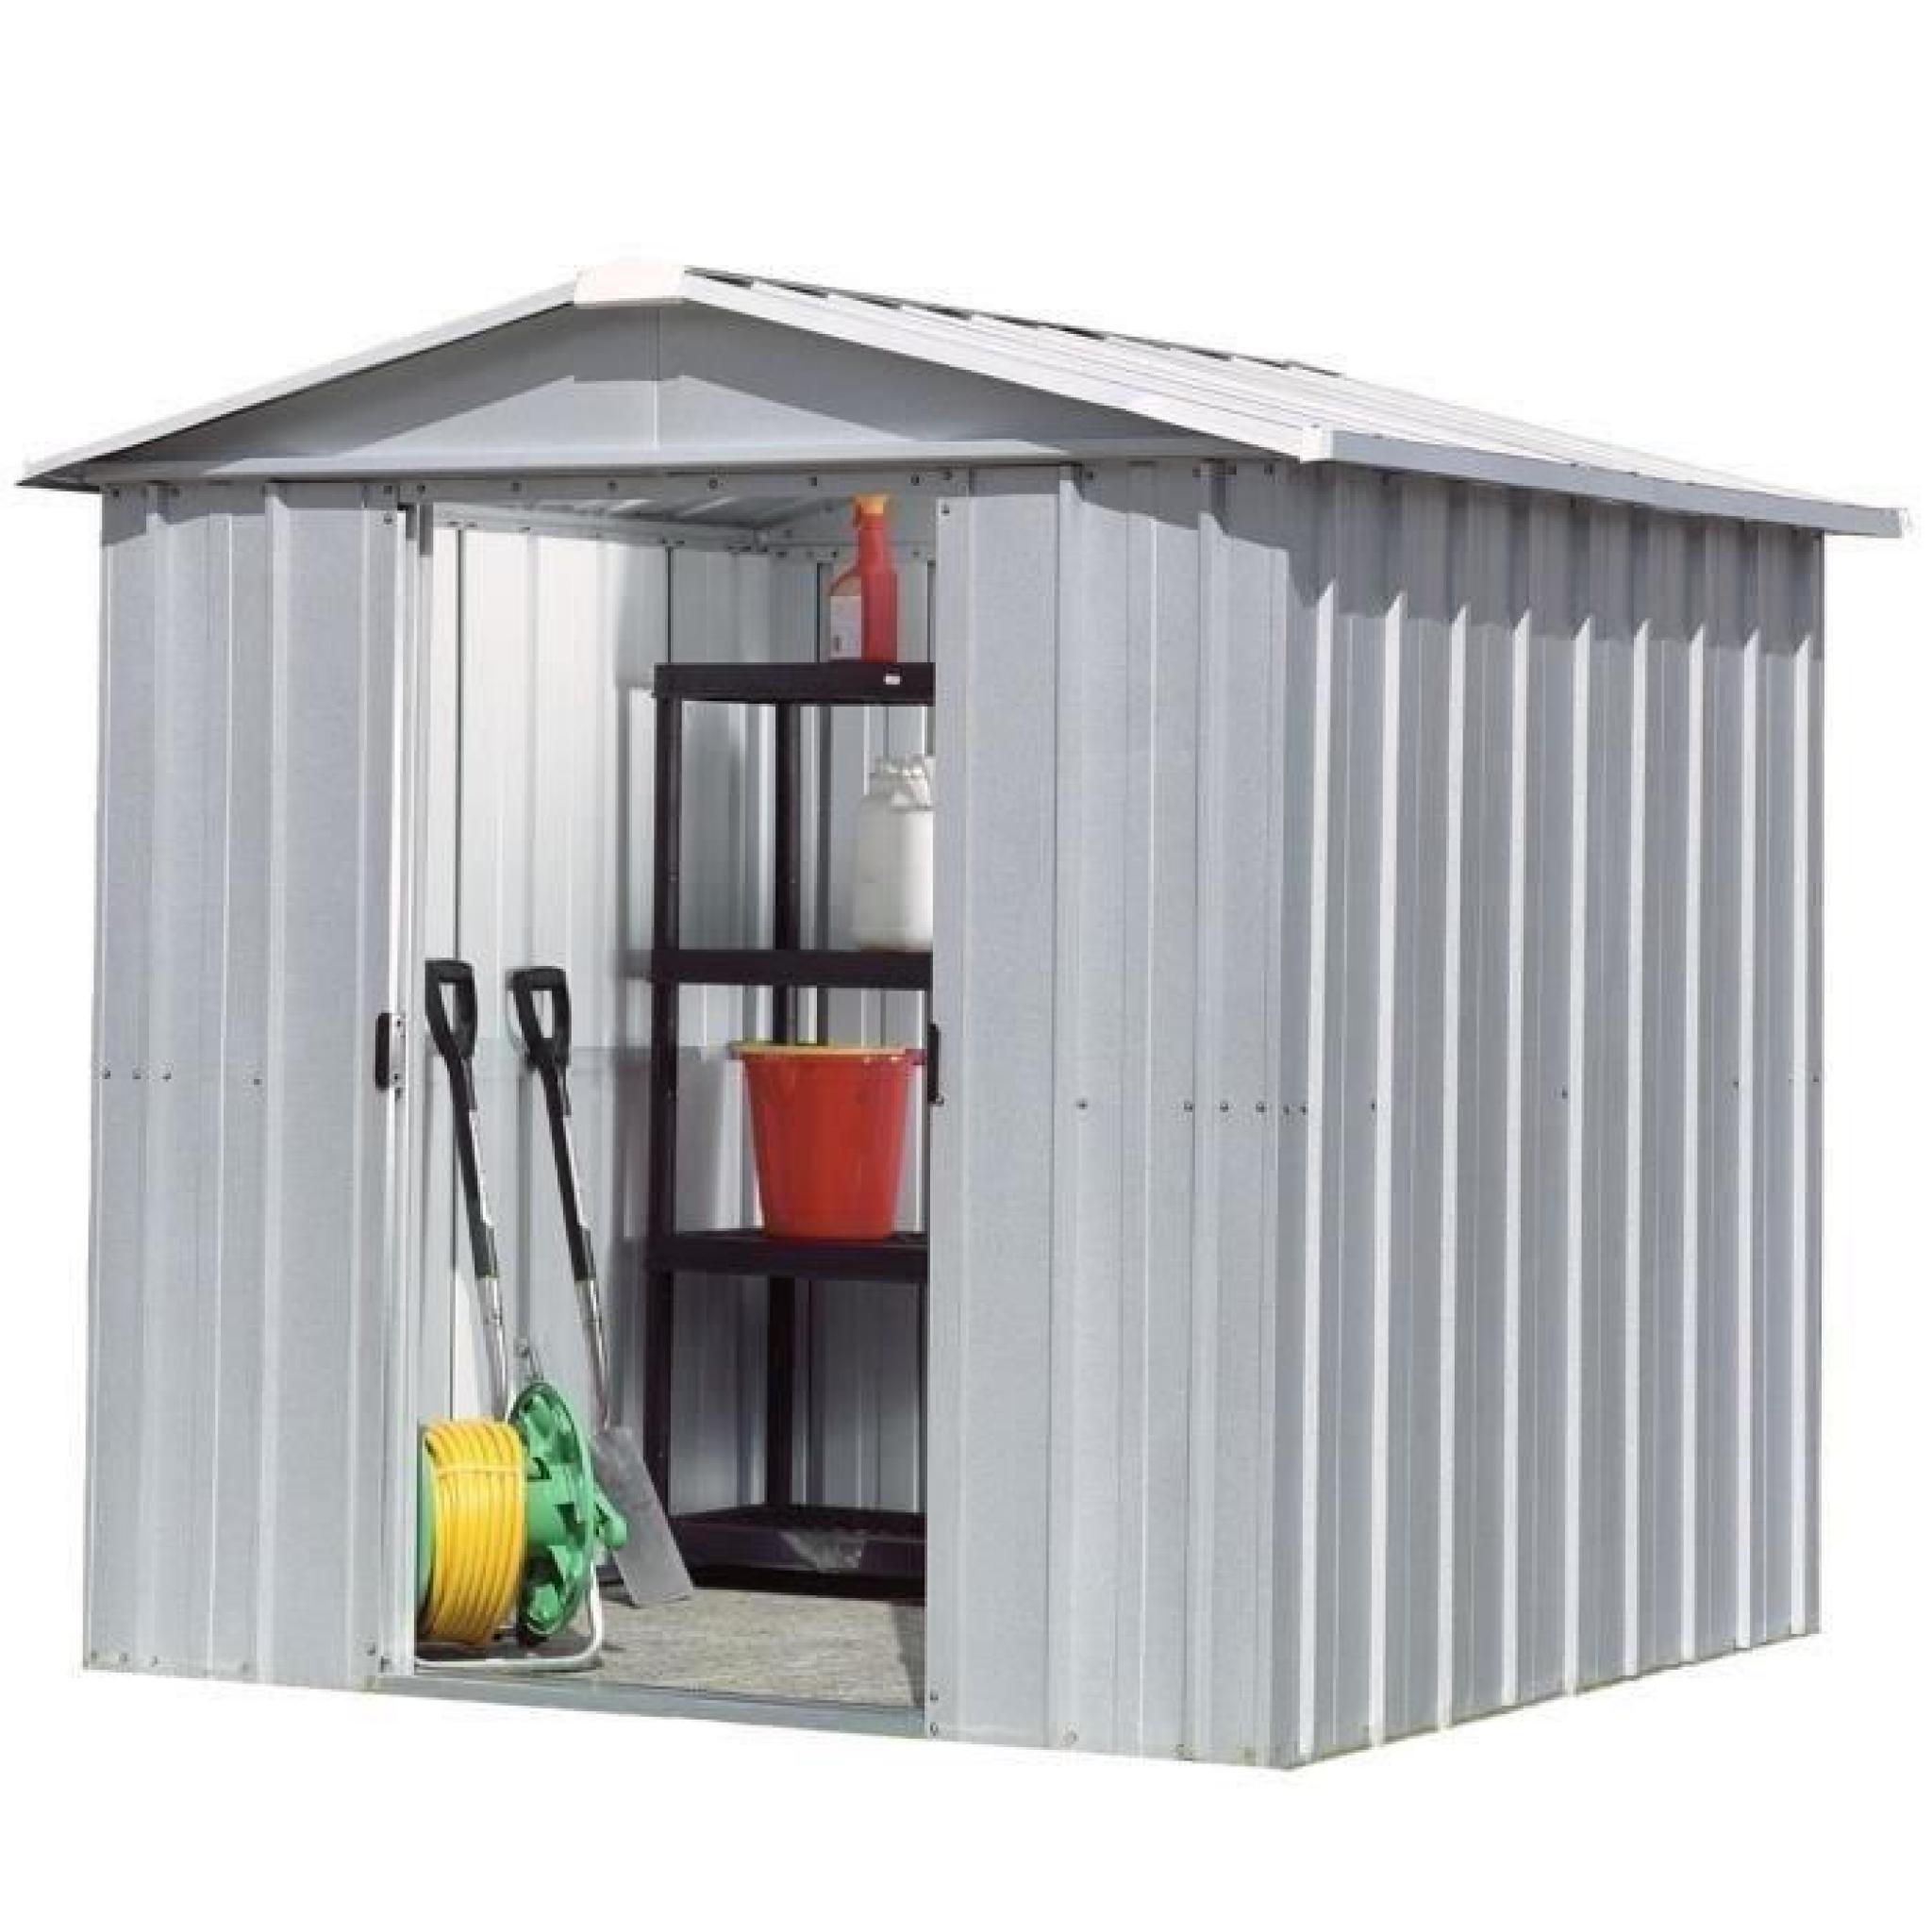 Yardmaster Abri De Jardin En Métal 4.79 M² destiné Abri De Jardin Pas Cher Metal